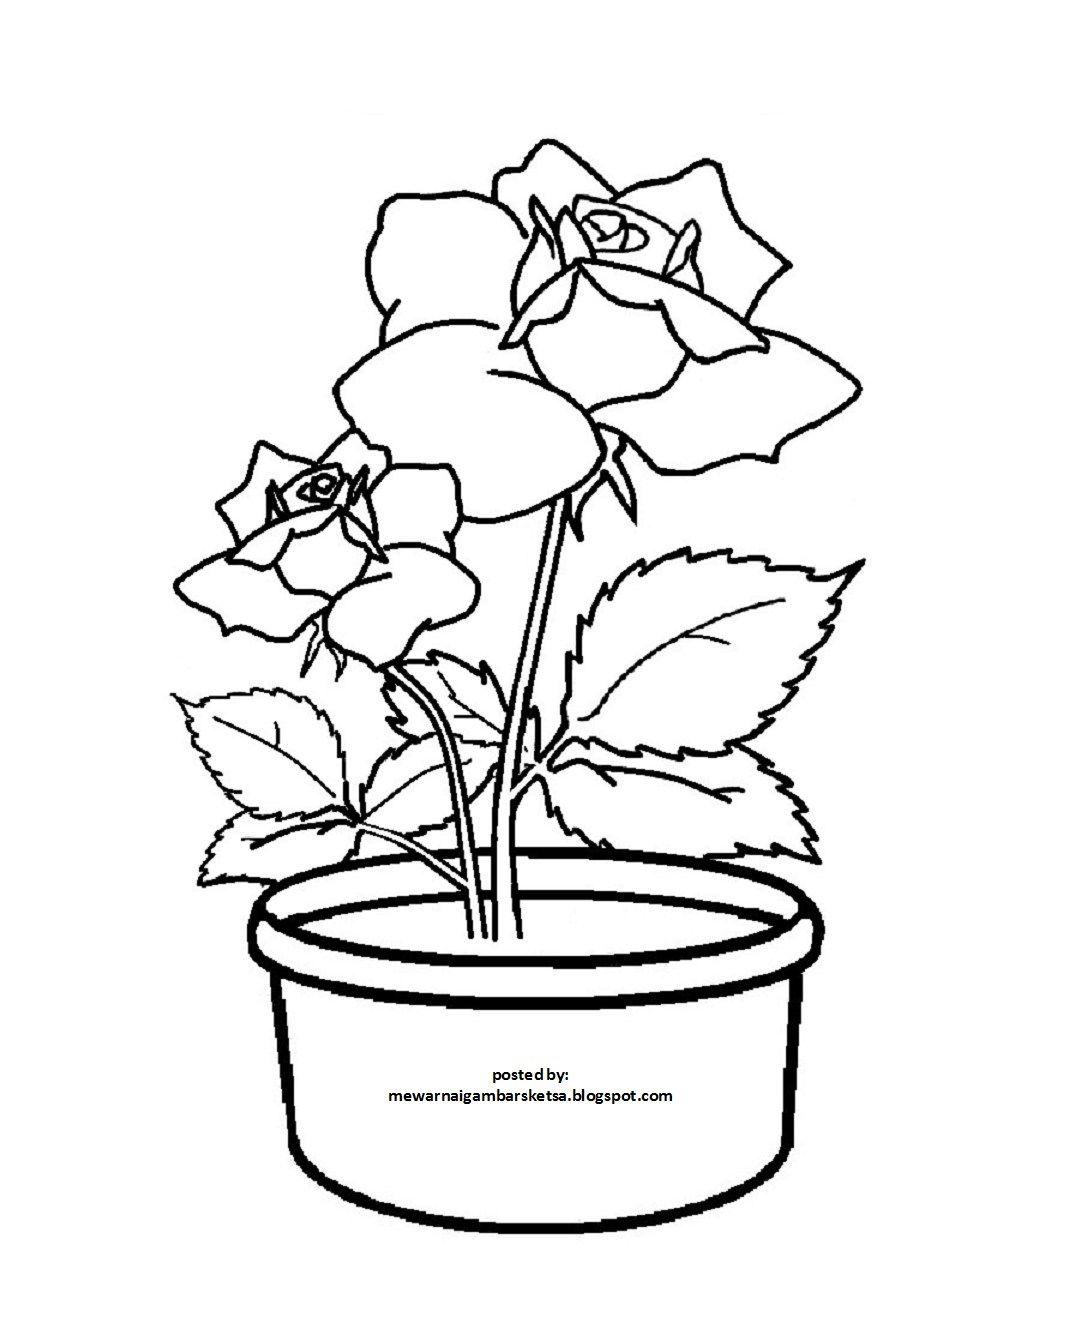 Contoh Gambar Bunga Mawar Yang Mudah Digambar